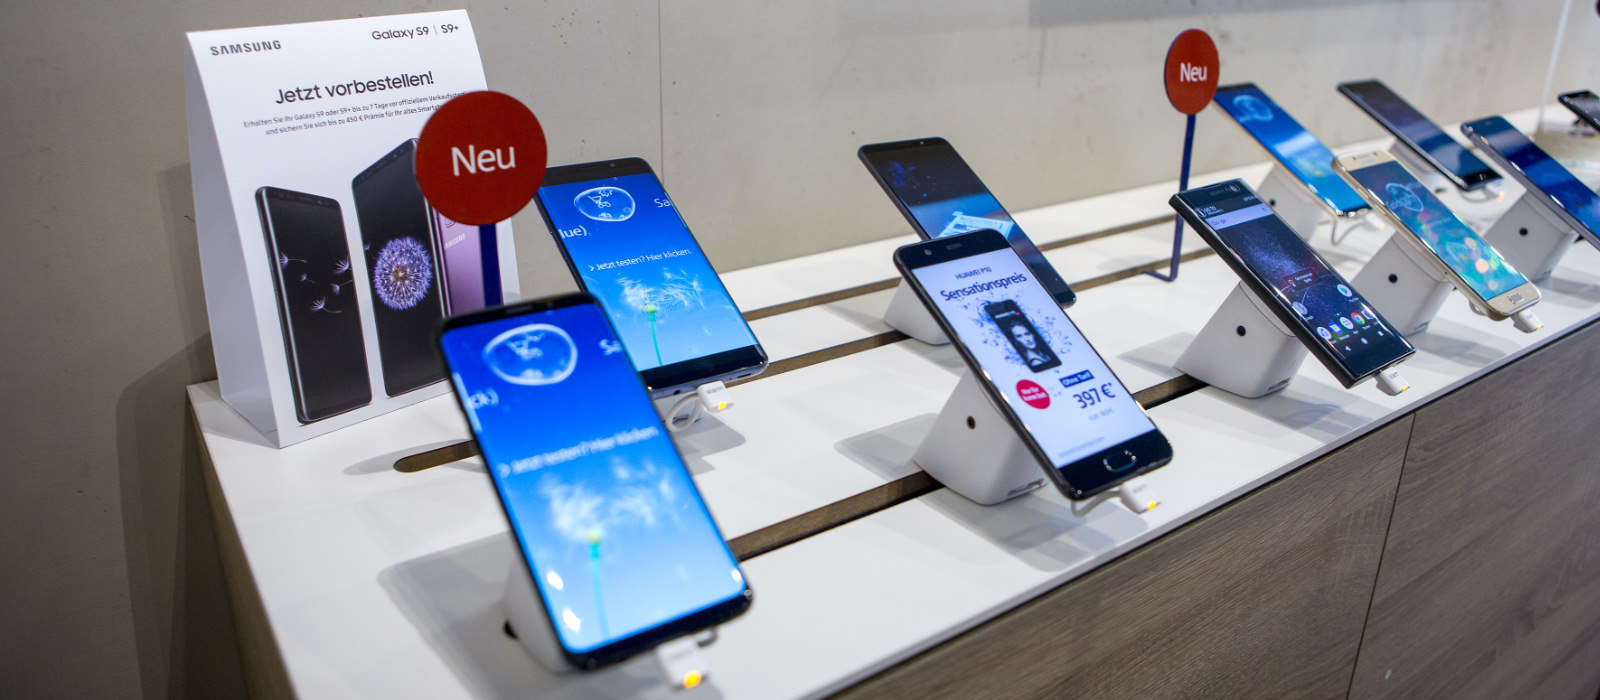 Telefonica o2 Aktion Smartphones